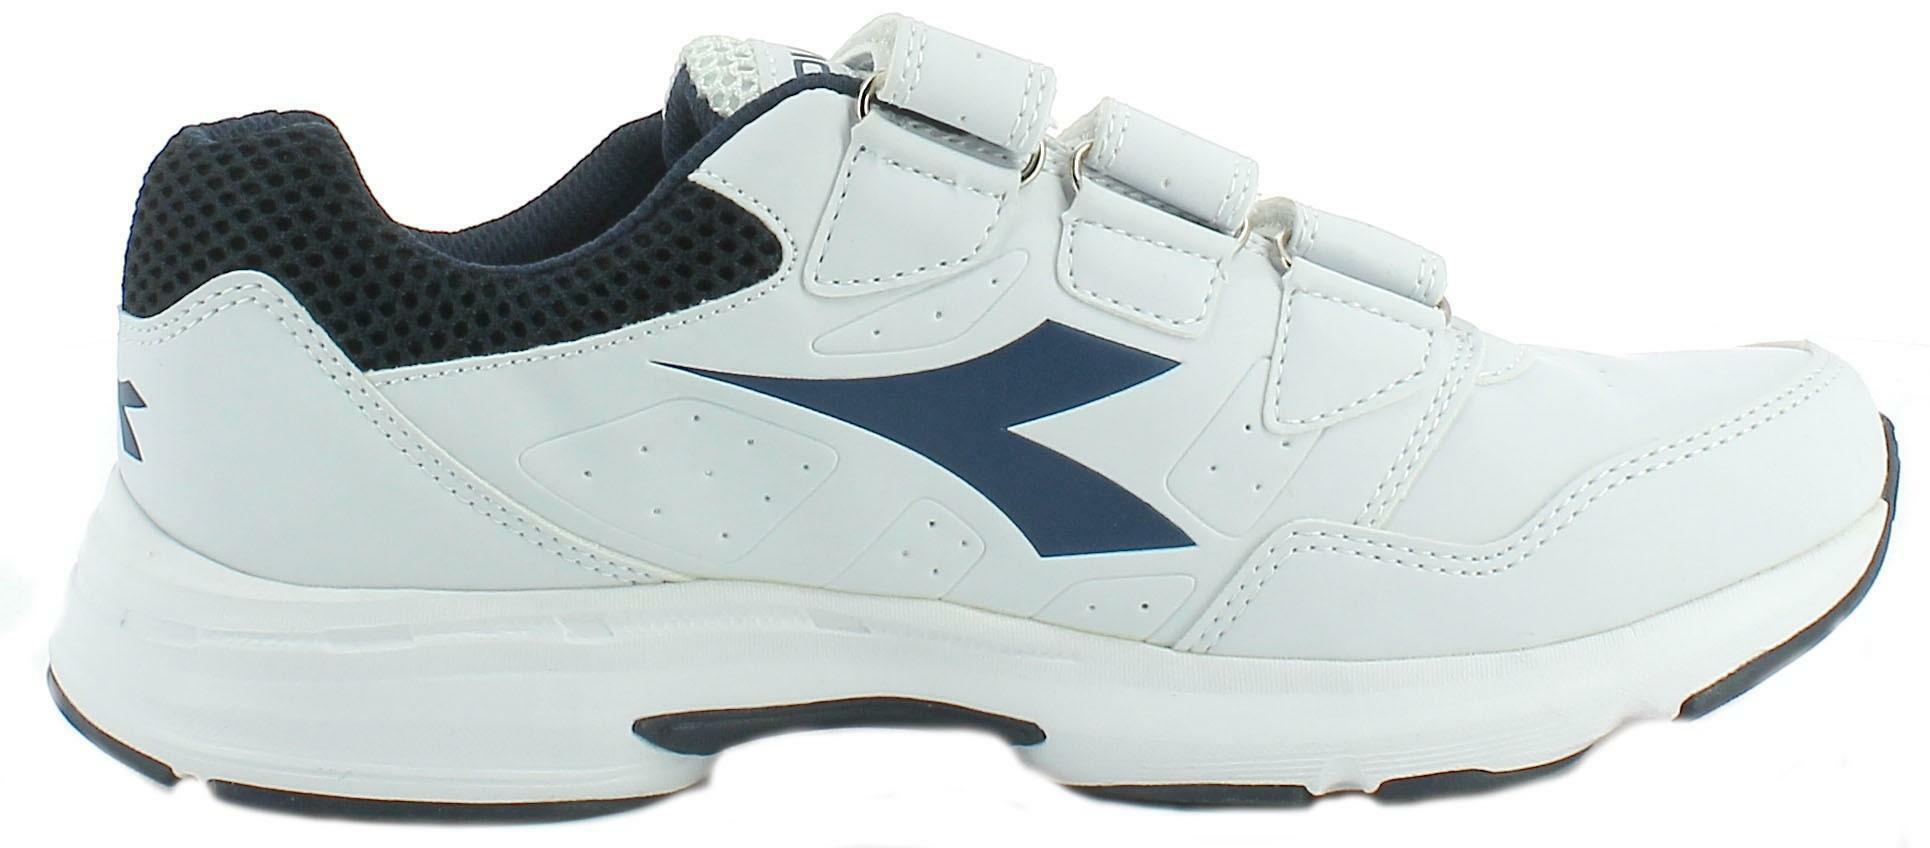 diadora diadora shape 6 sl v scarpe sportive uomo bianche pelle